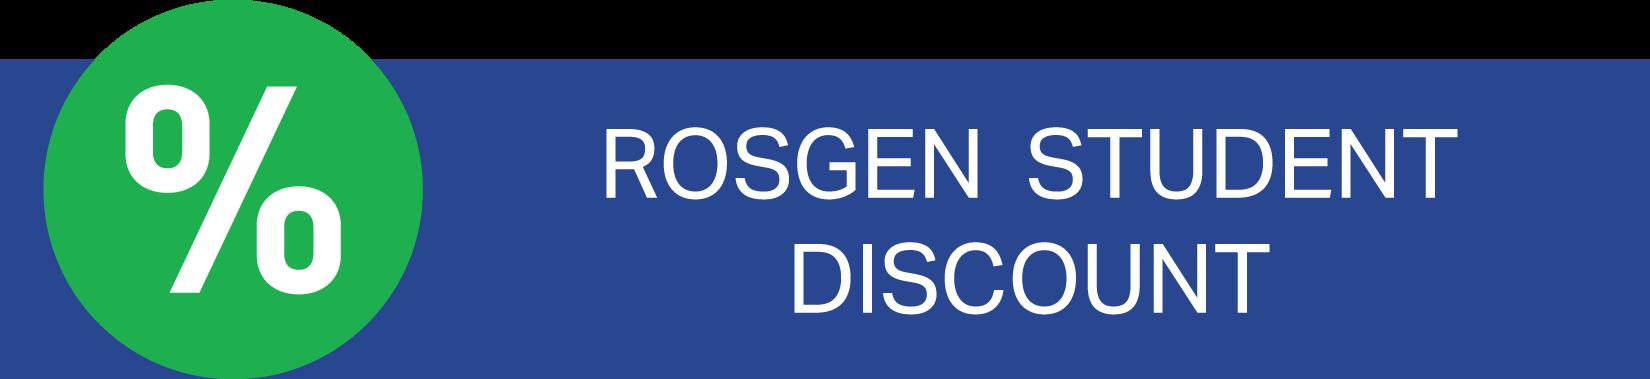 former rosgen students get a 15% discount